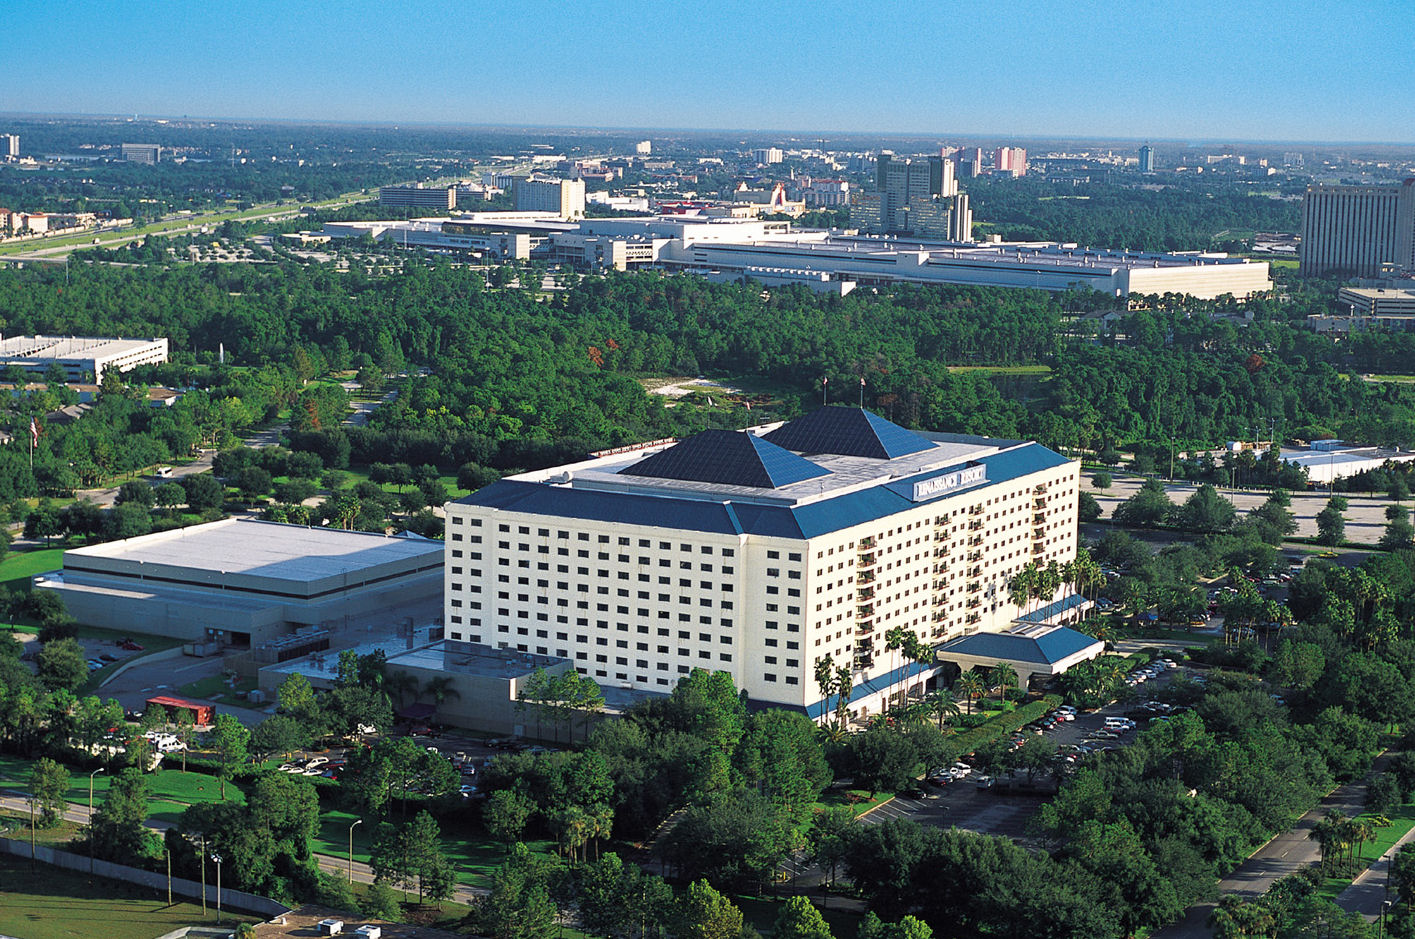 Renaissance Orlando Resort